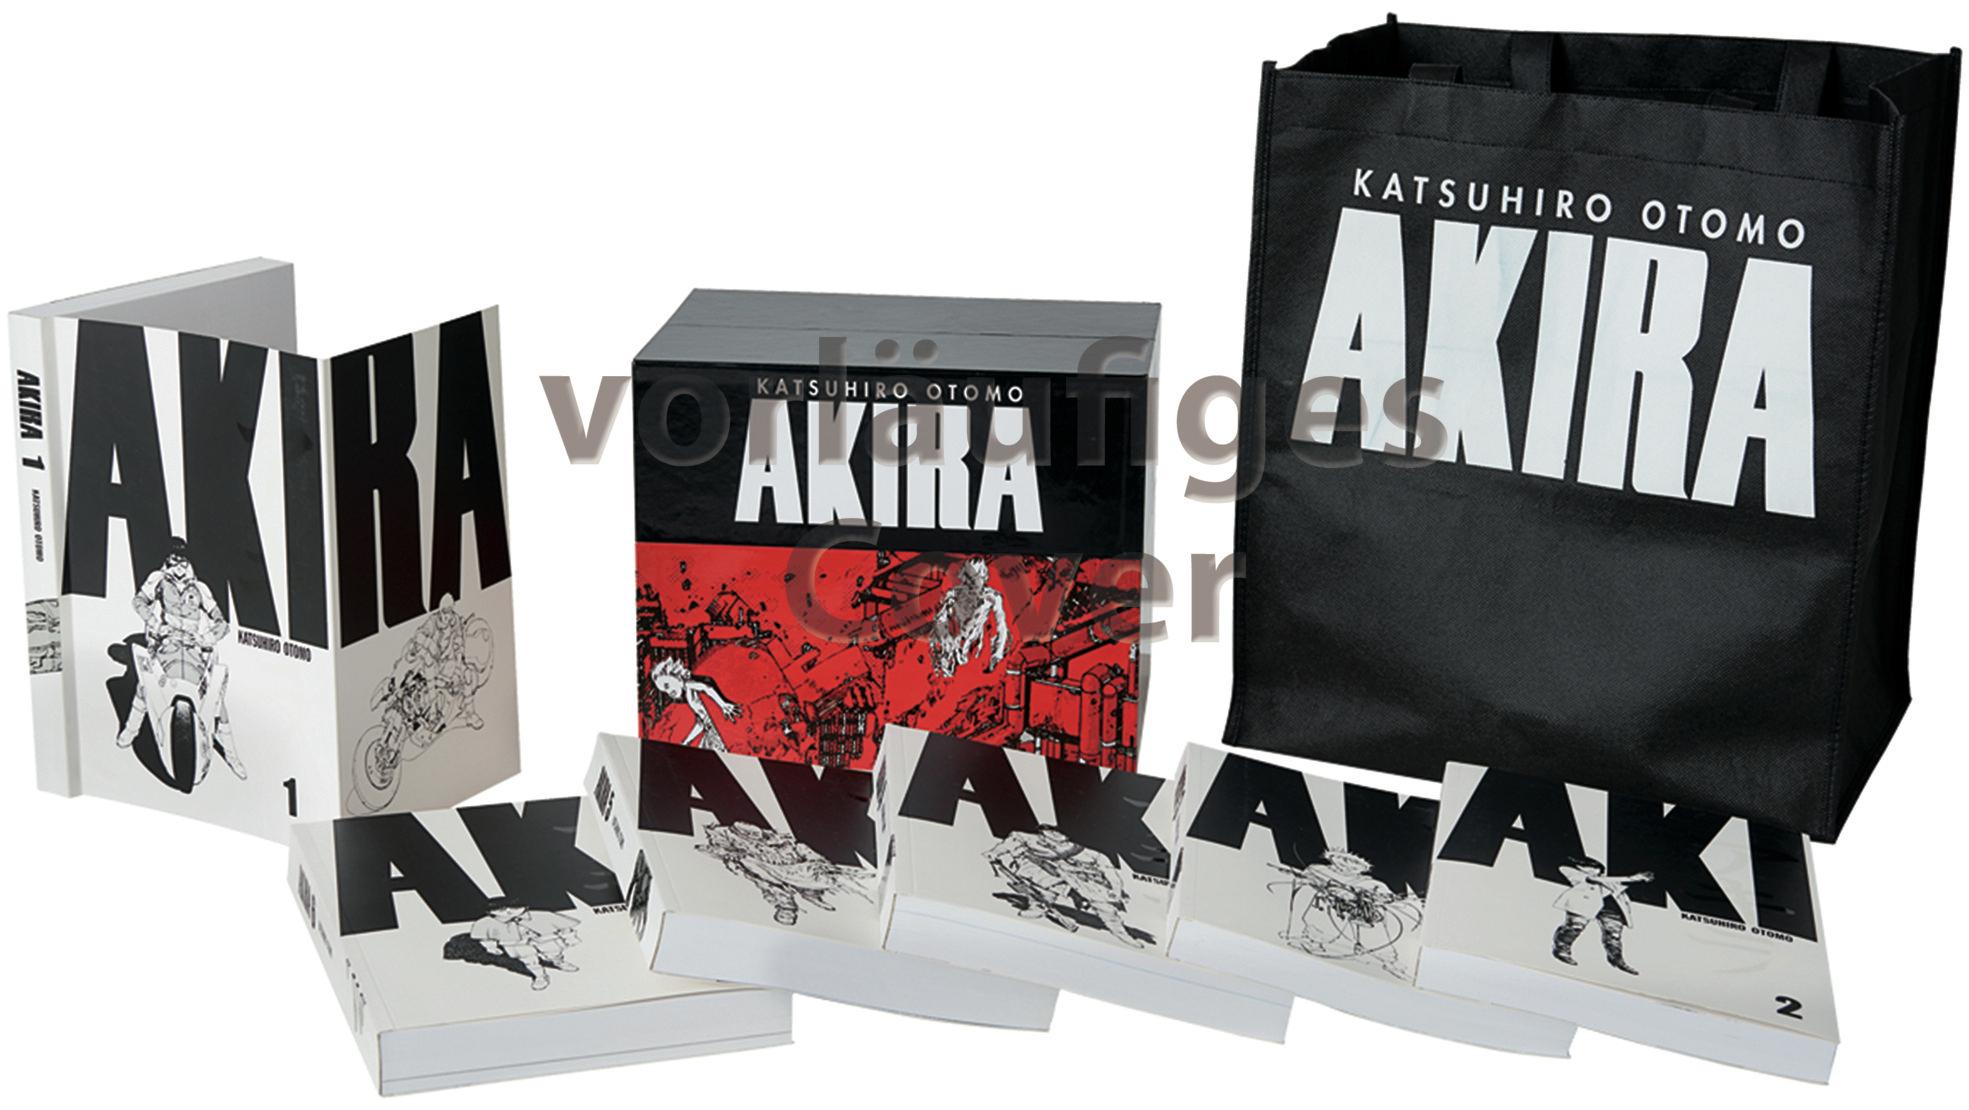 Akira-Farbige-Gesamtausgabe-in-limitierter-Box-Katsuhiro-Otomo